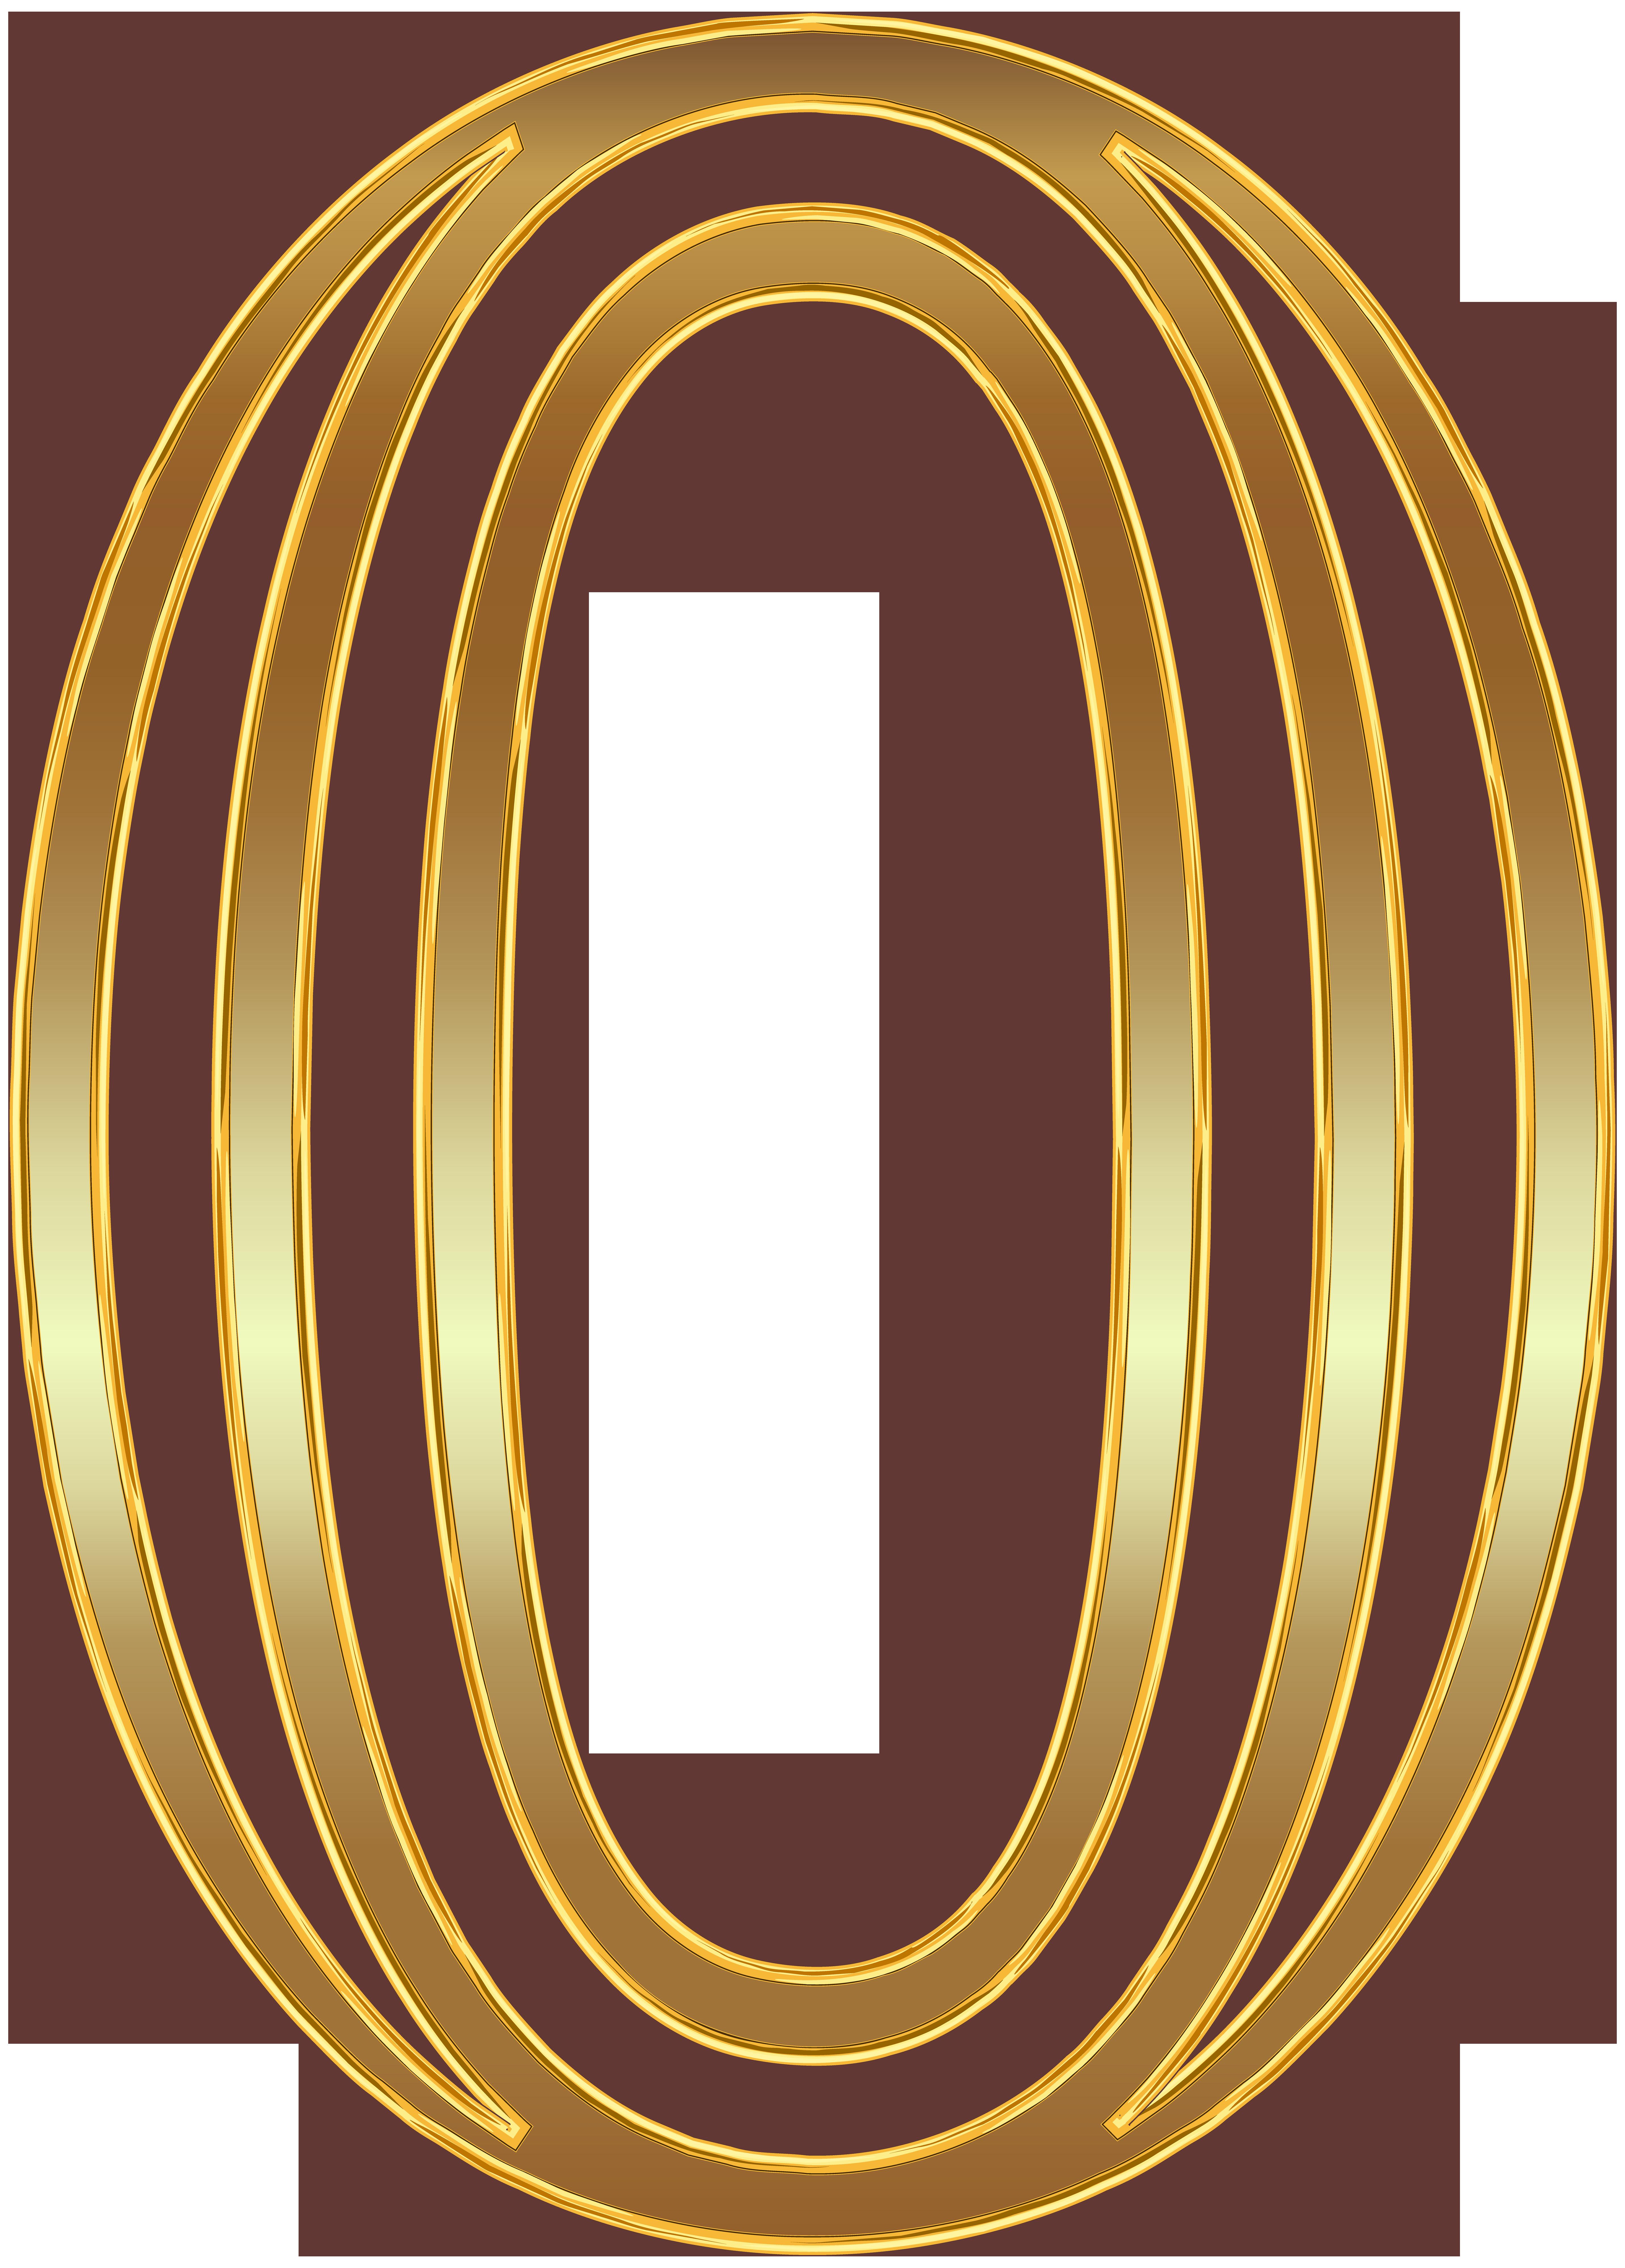 Number Zero Gold PNG Clip Art Image